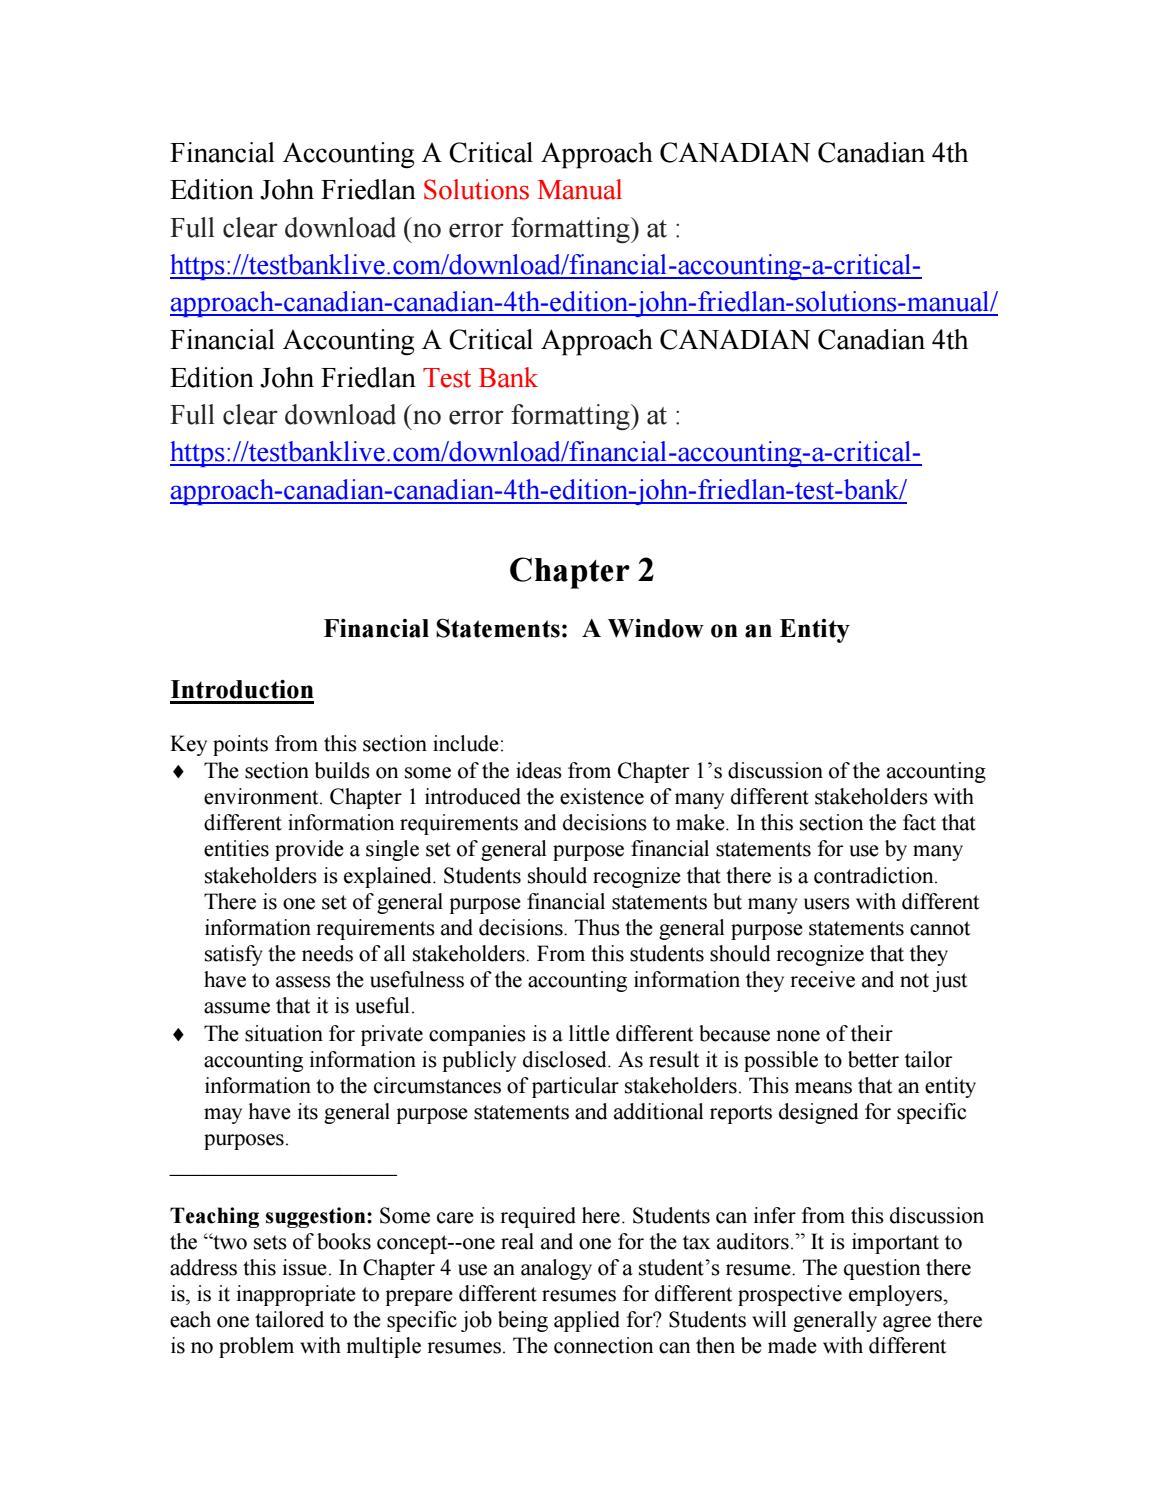 Financial accounting a critical approach canadian canadian 4th edition john  friedlan solutions manua by kingdom488 - issuu